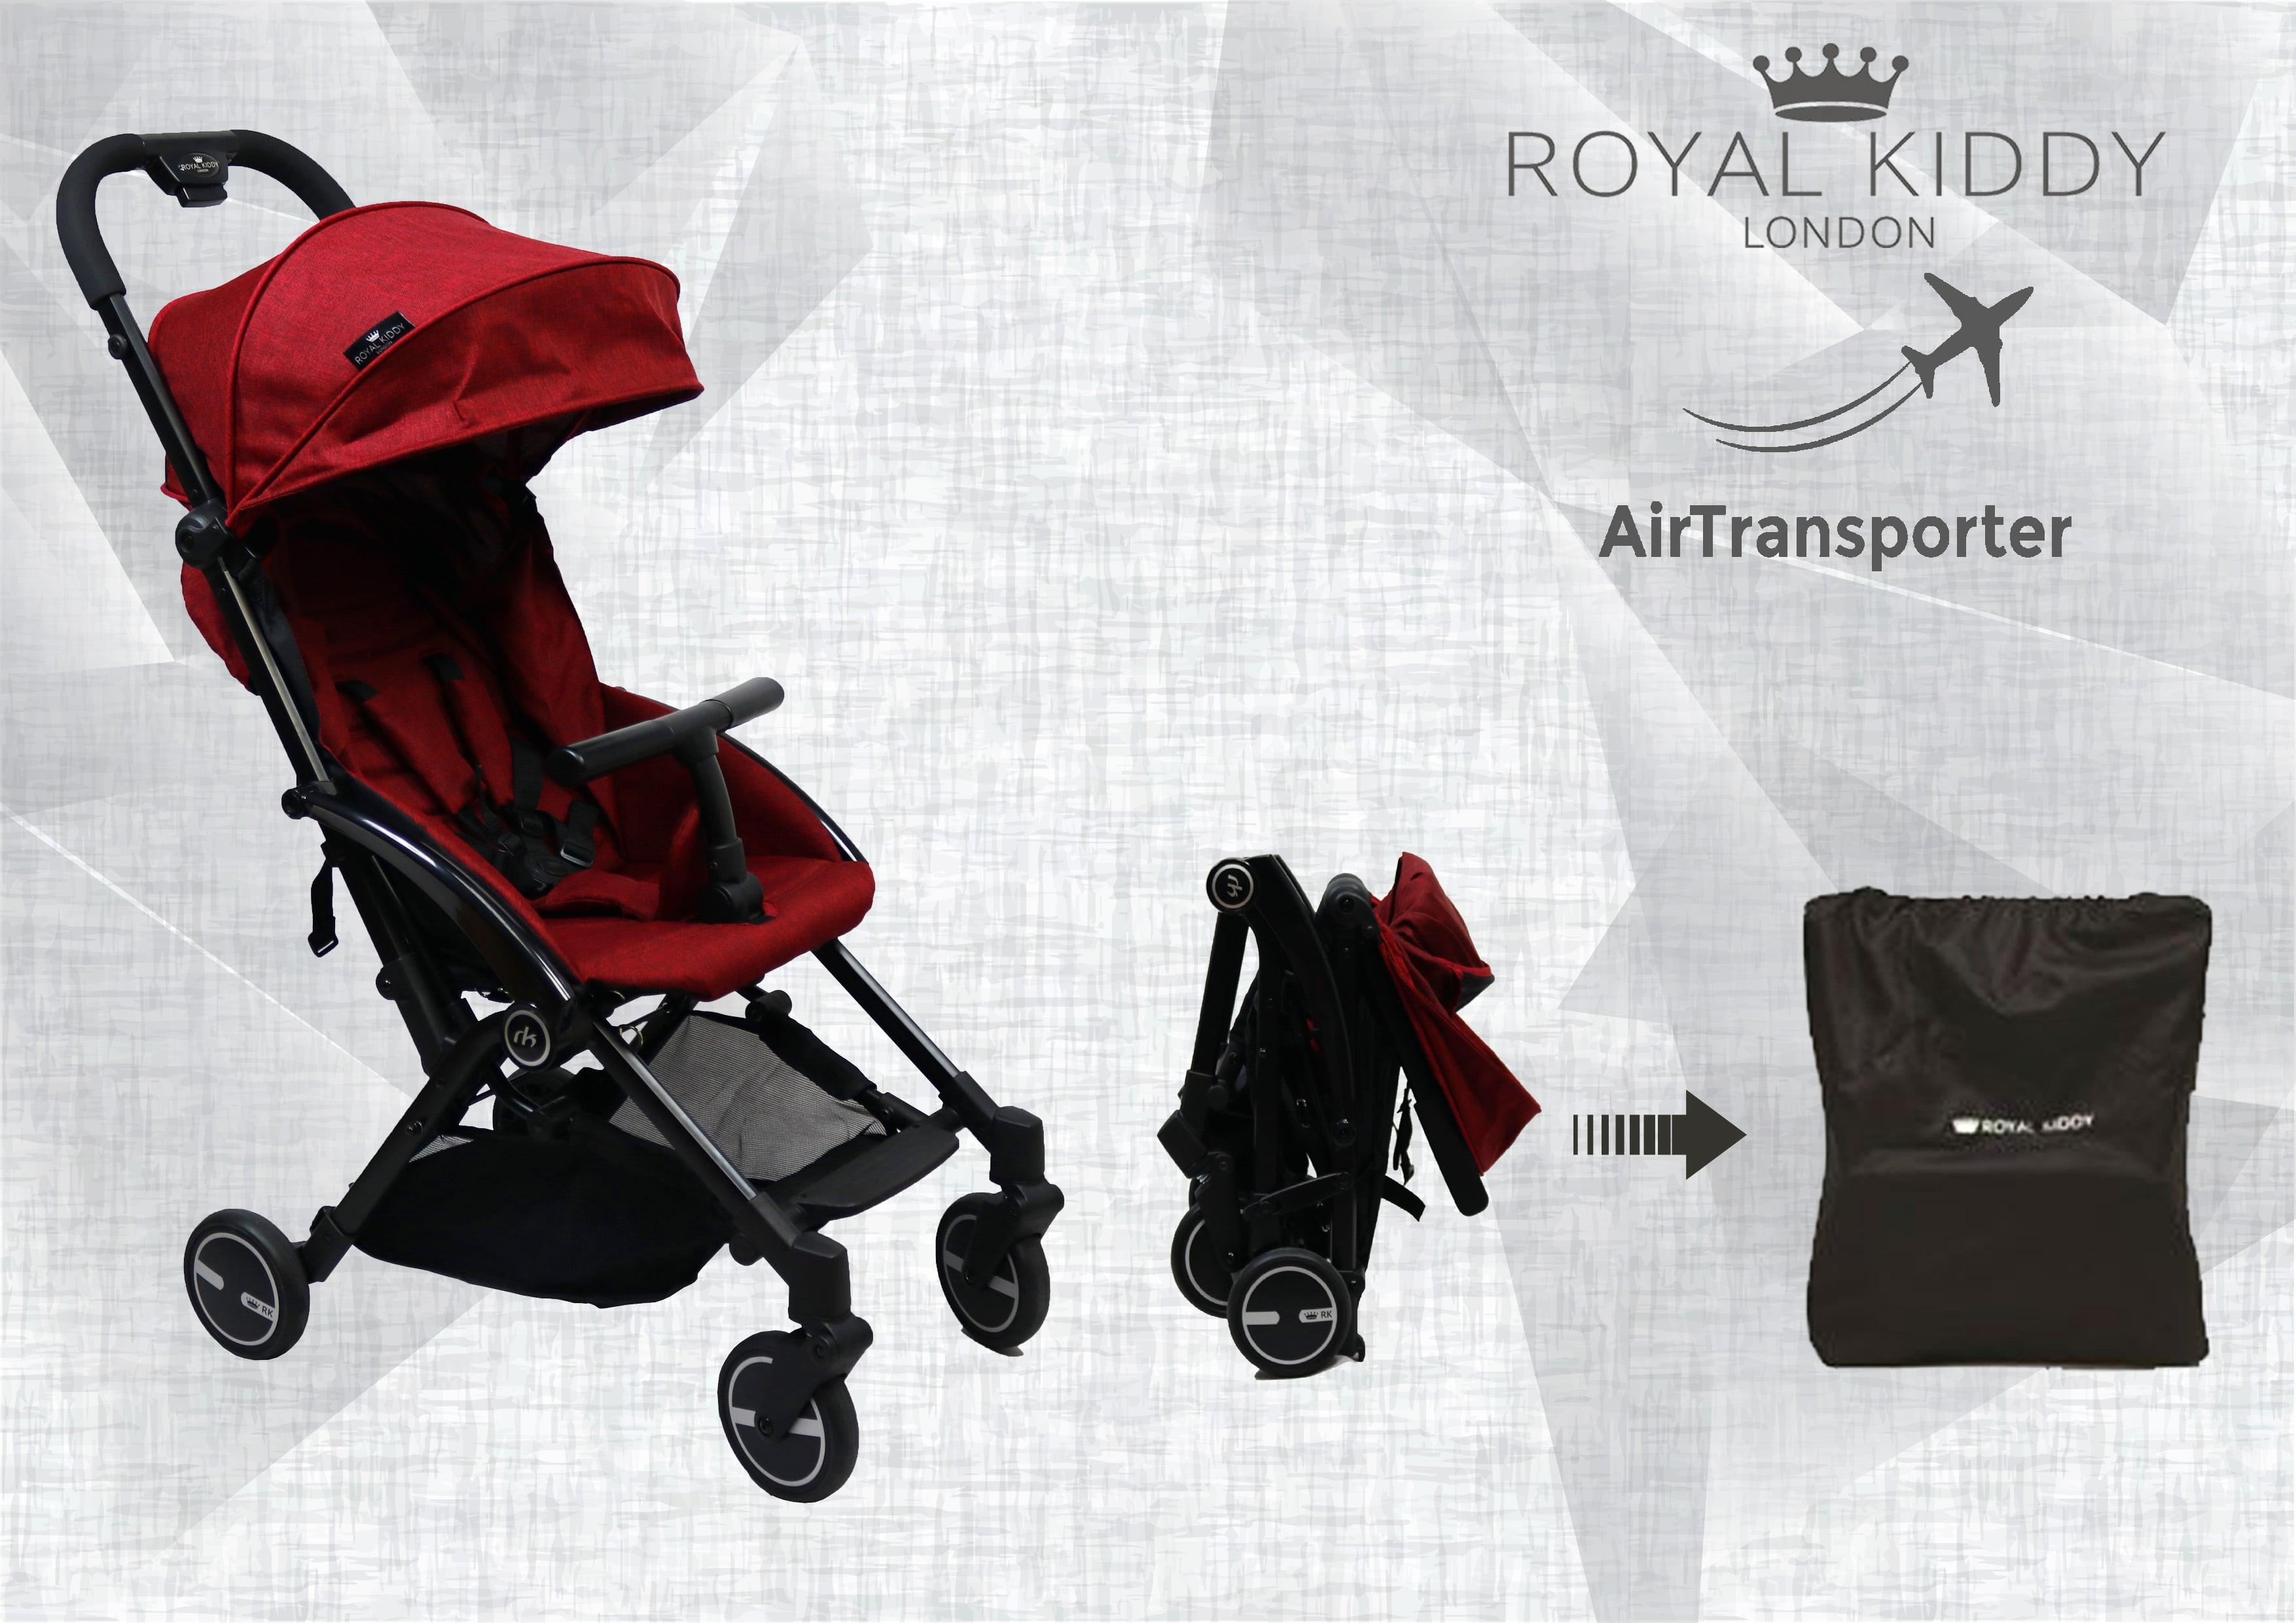 Royal Kiddy London The Air Transporter Stroller (Red)